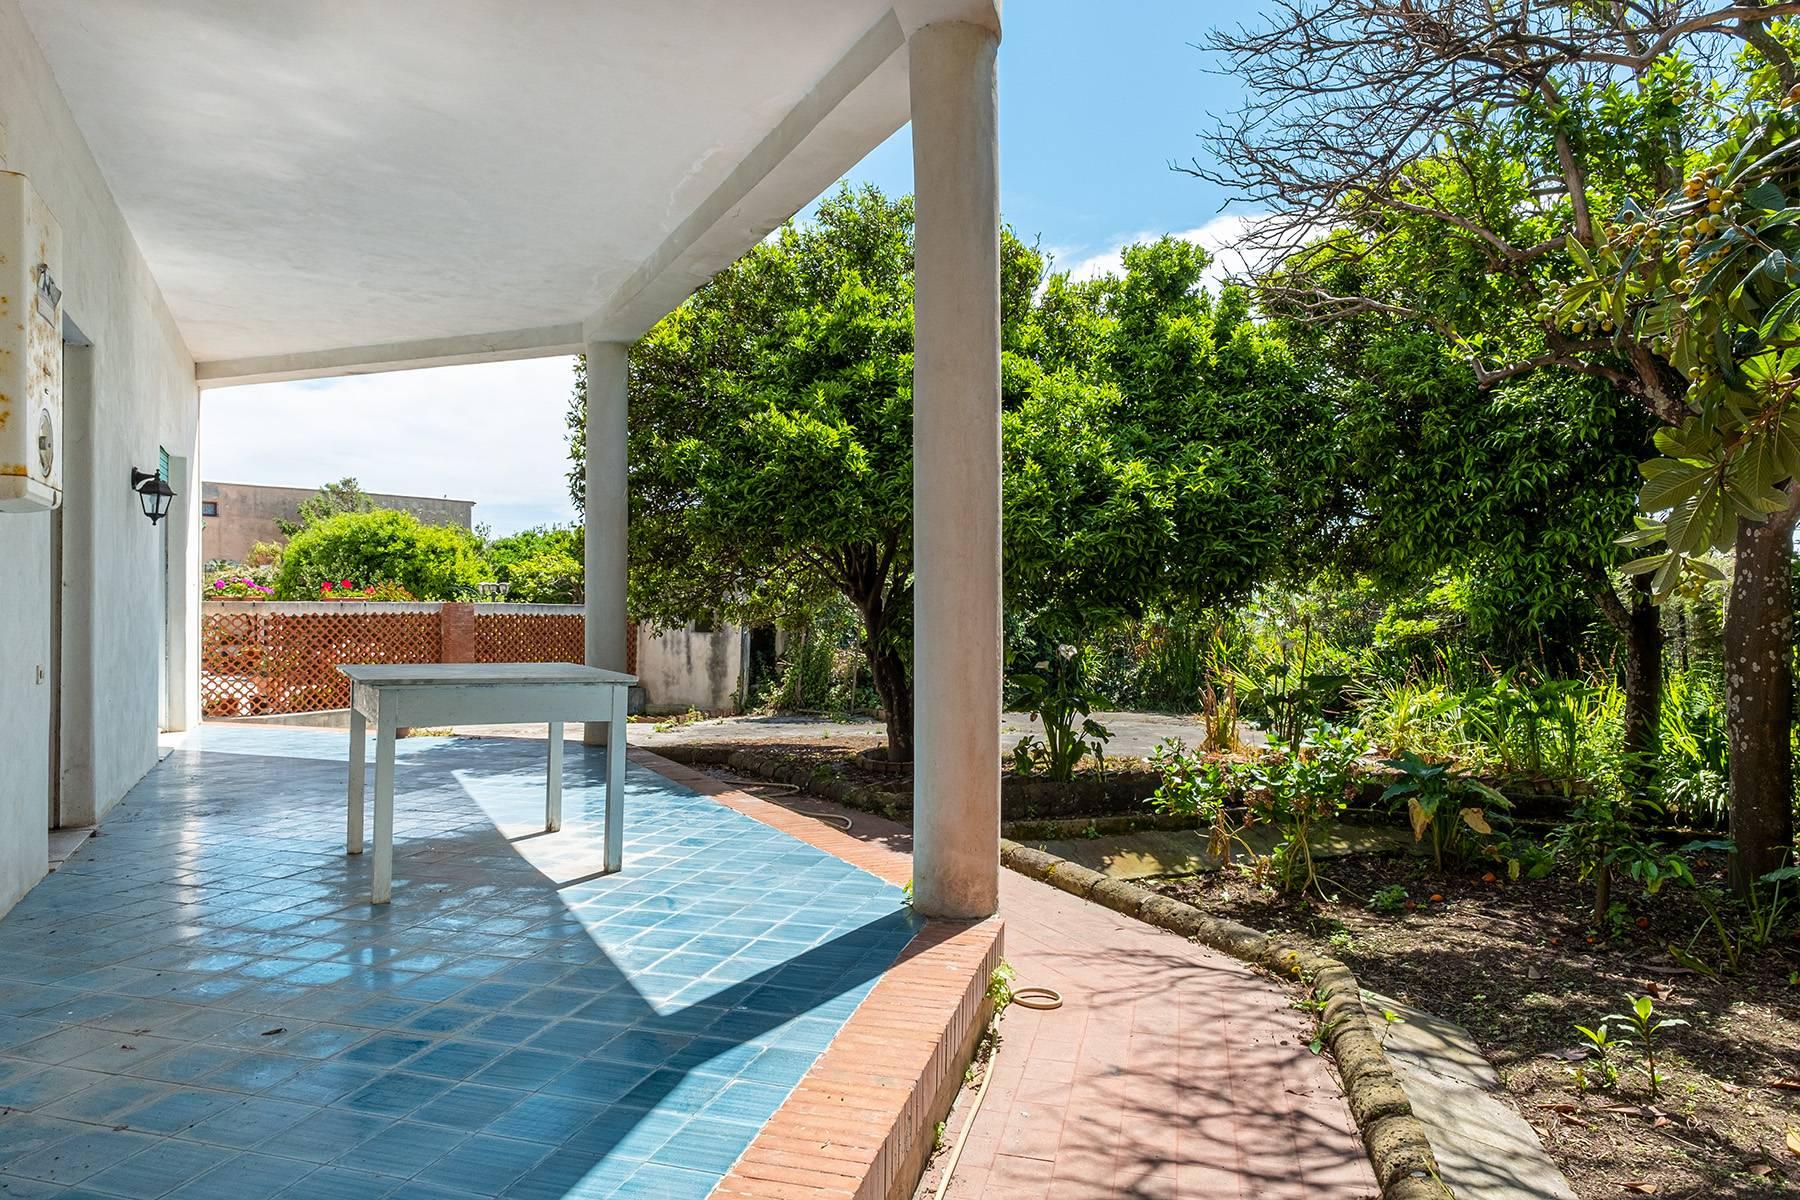 Casa indipendente in Vendita a Procida: 5 locali, 300 mq - Foto 12